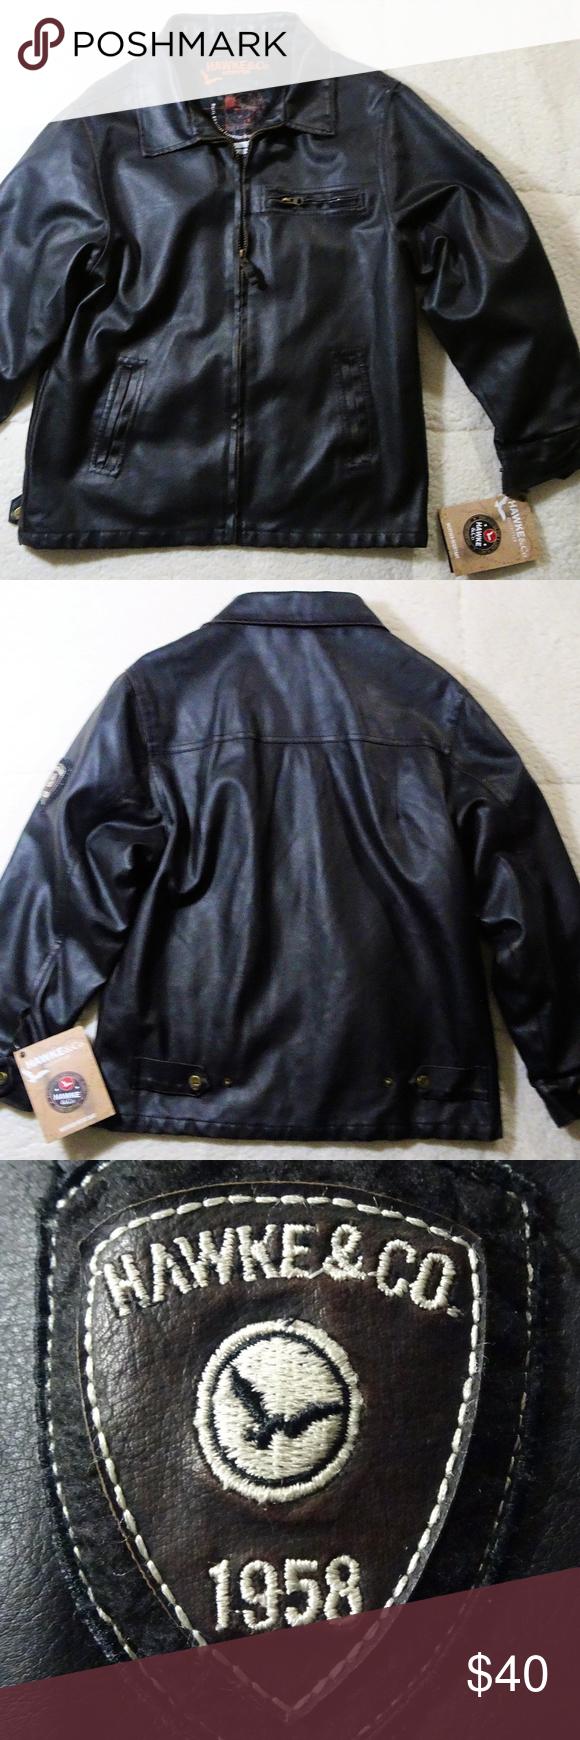 Nwt Hawke Co Faux Leather Bomber Jacket Sz 14 16 Bomber Jacket Faux Leather Bomber Jacket Jackets [ 1740 x 580 Pixel ]